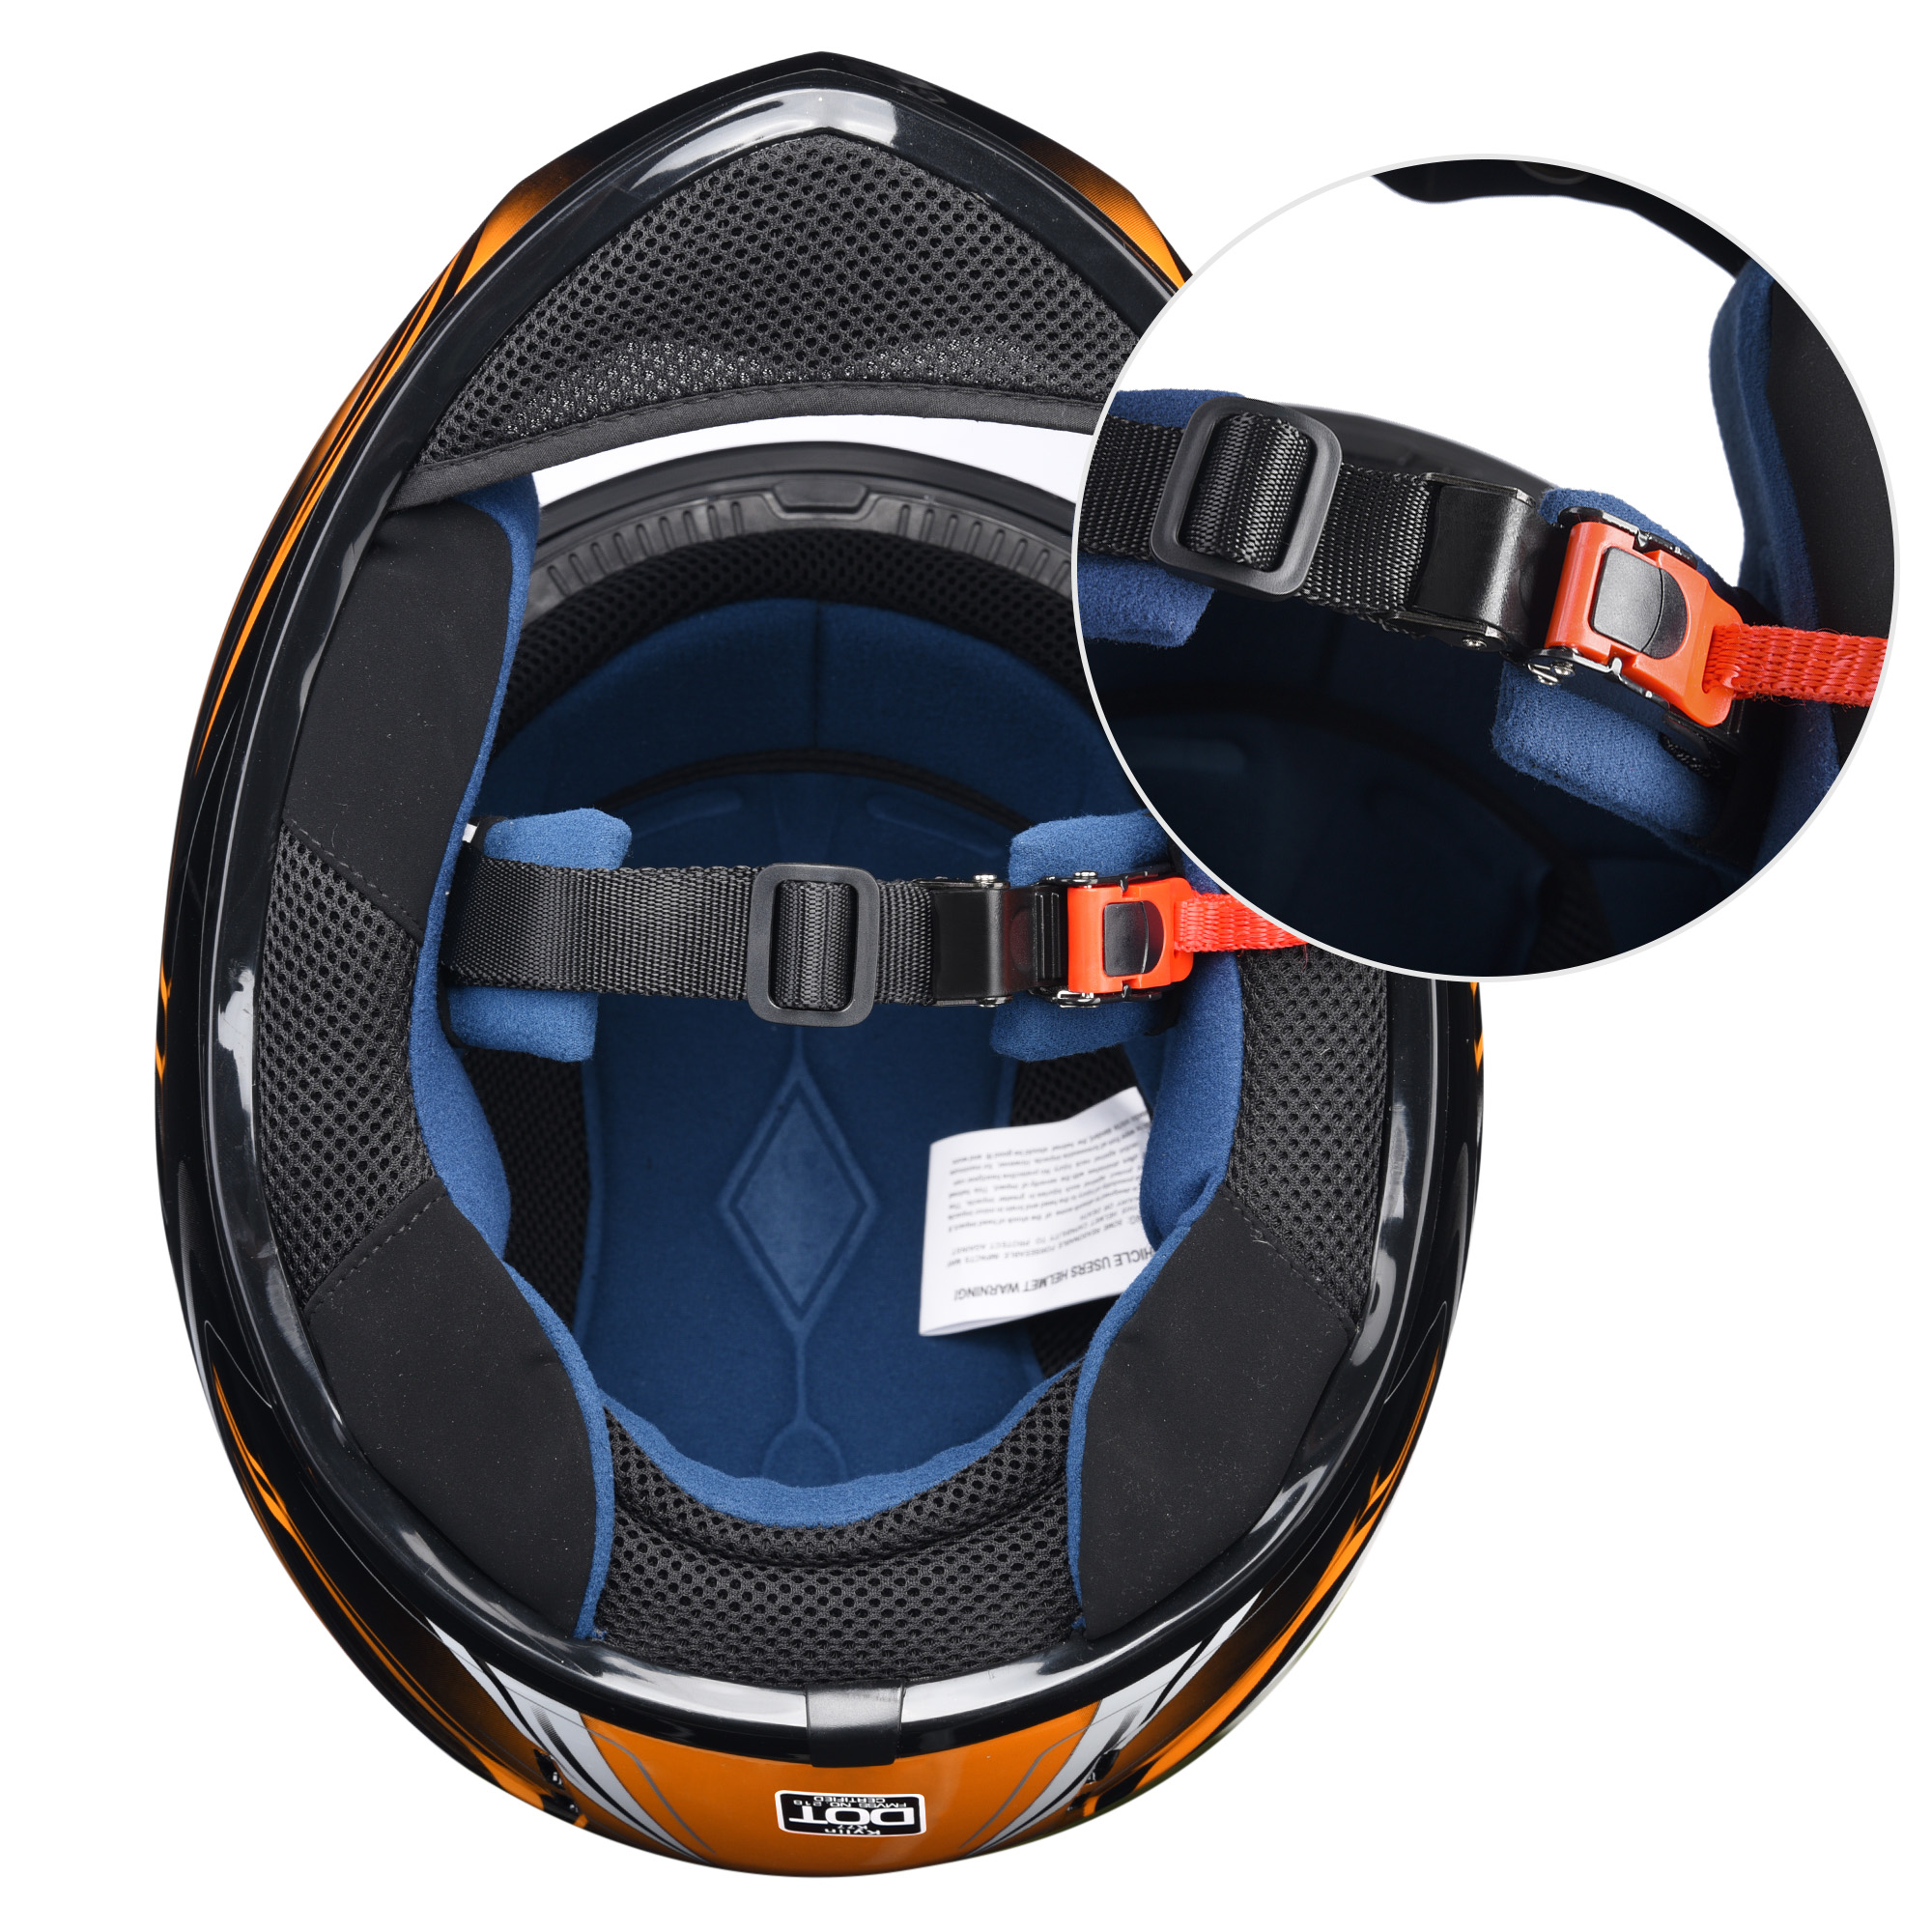 miniature 150 - AHR K12 Full Face Motorcycle Helmet DOT Air Vents Clear Visor Racing S M L XL